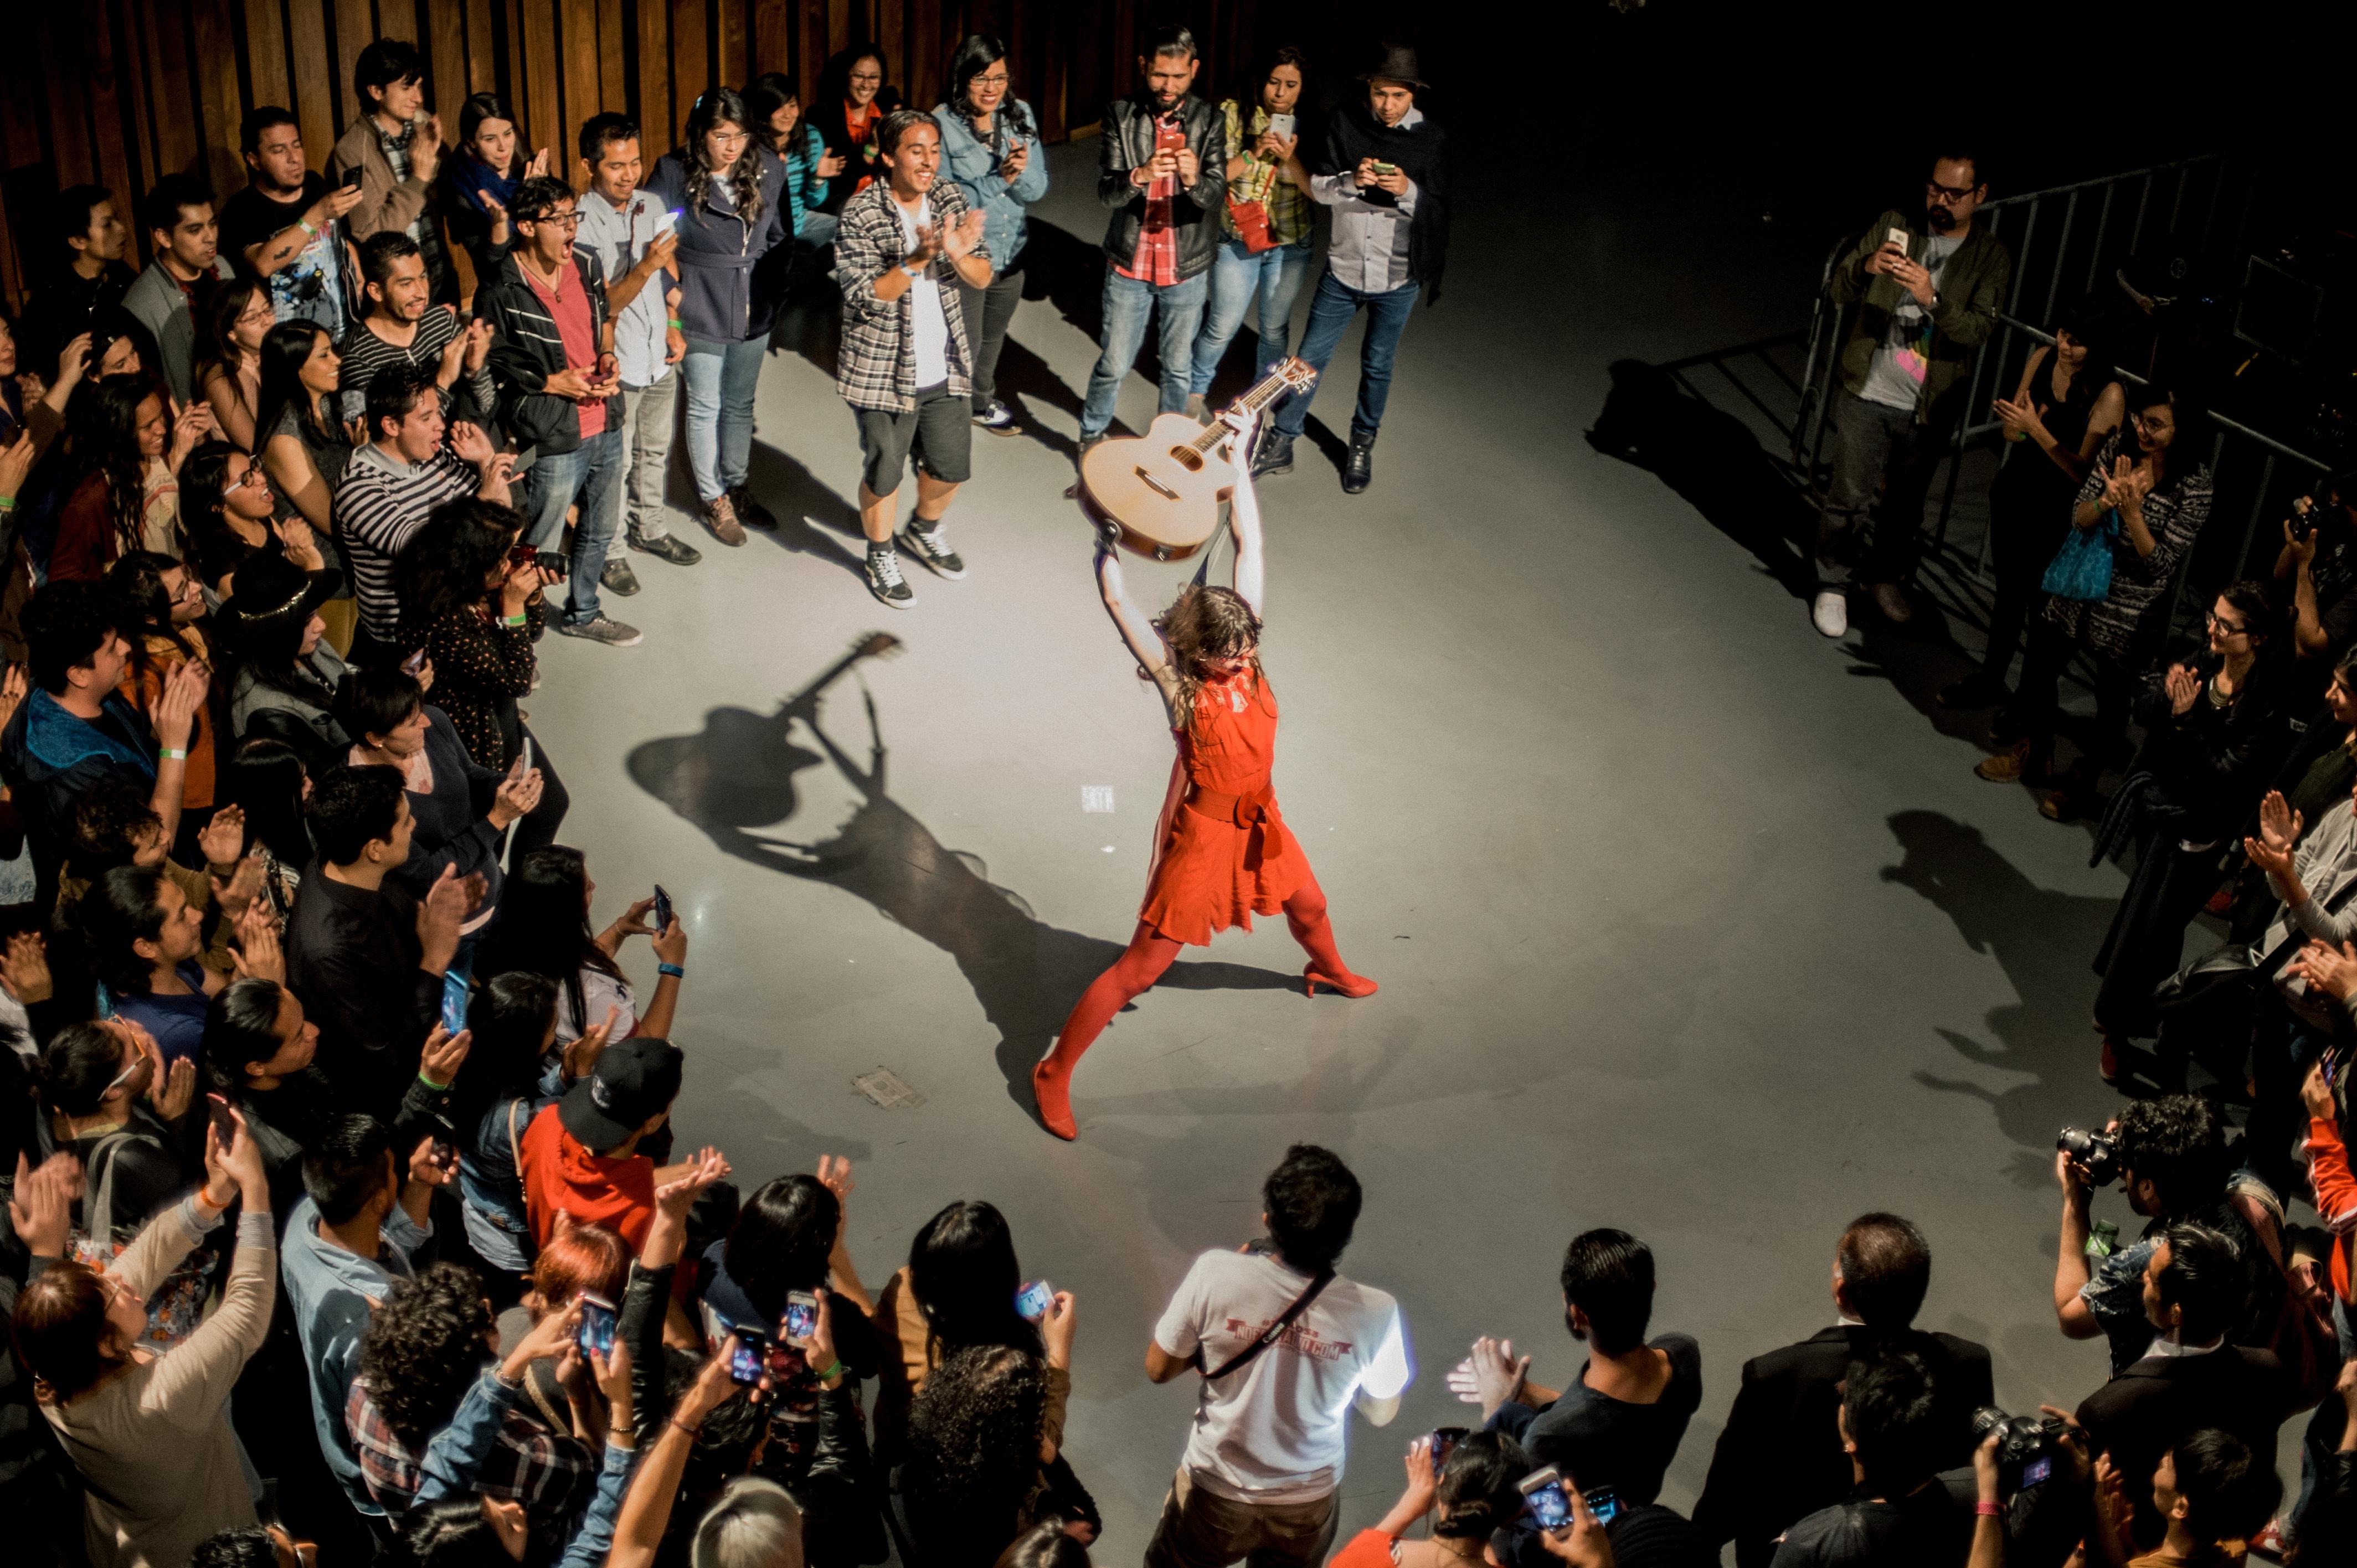 Ruidosa Festival Announces 2019 Edition Featuring Kelela, The Marías and More